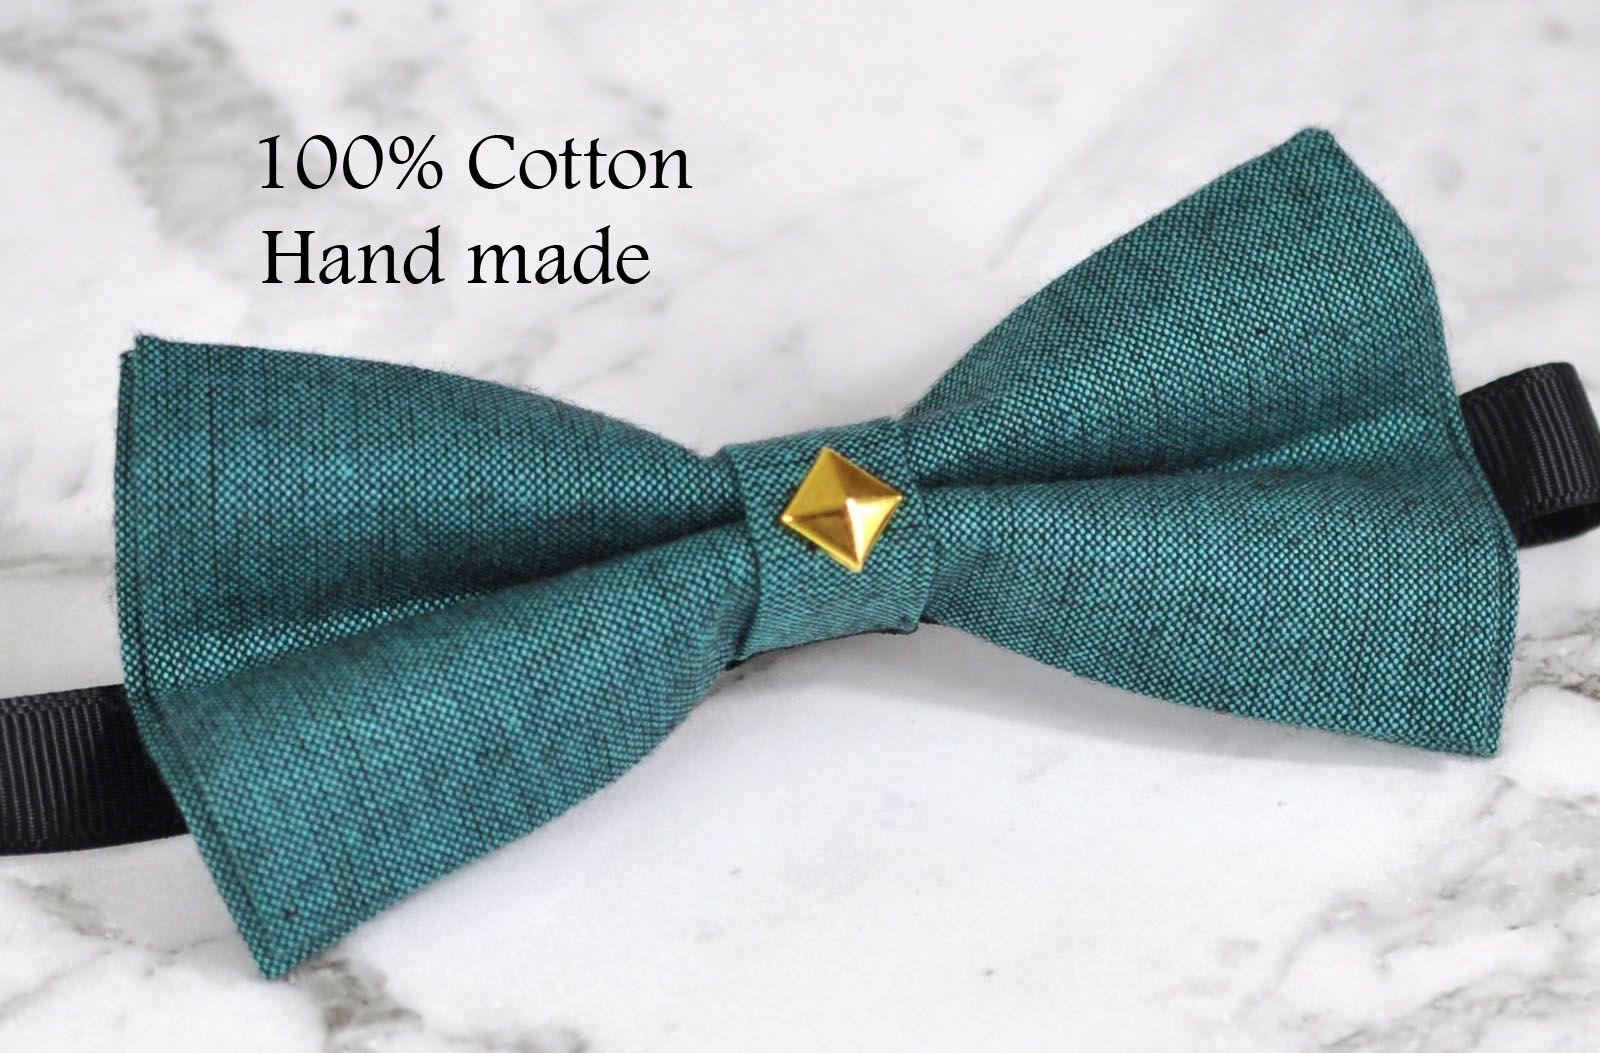 Boy Kids Baby 100/% Cotton Aqua Blue Bow Tie Bowtie Party Wedding 1-6 Years Old